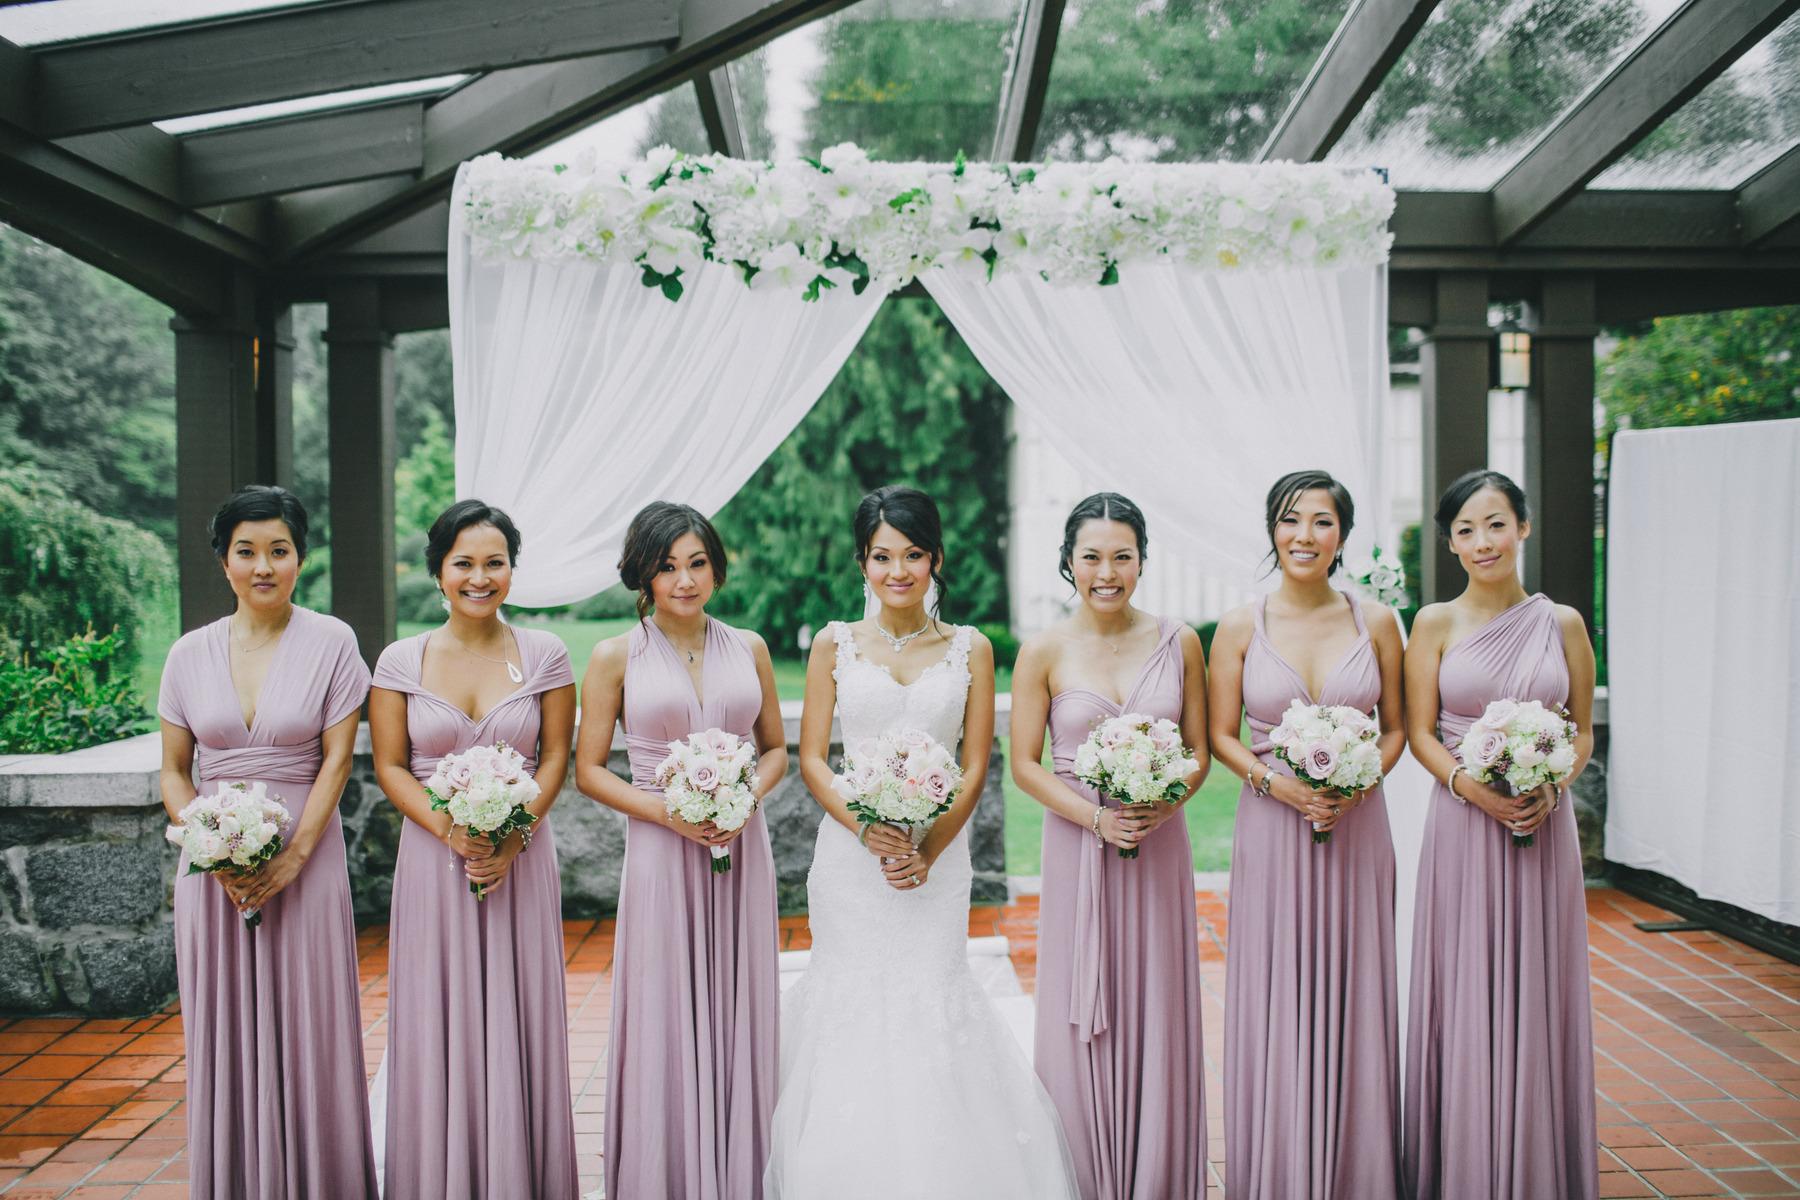 Tianna-Tran-Vancouver-Wedding-Makeup-Artist-Bridal-032.jpg